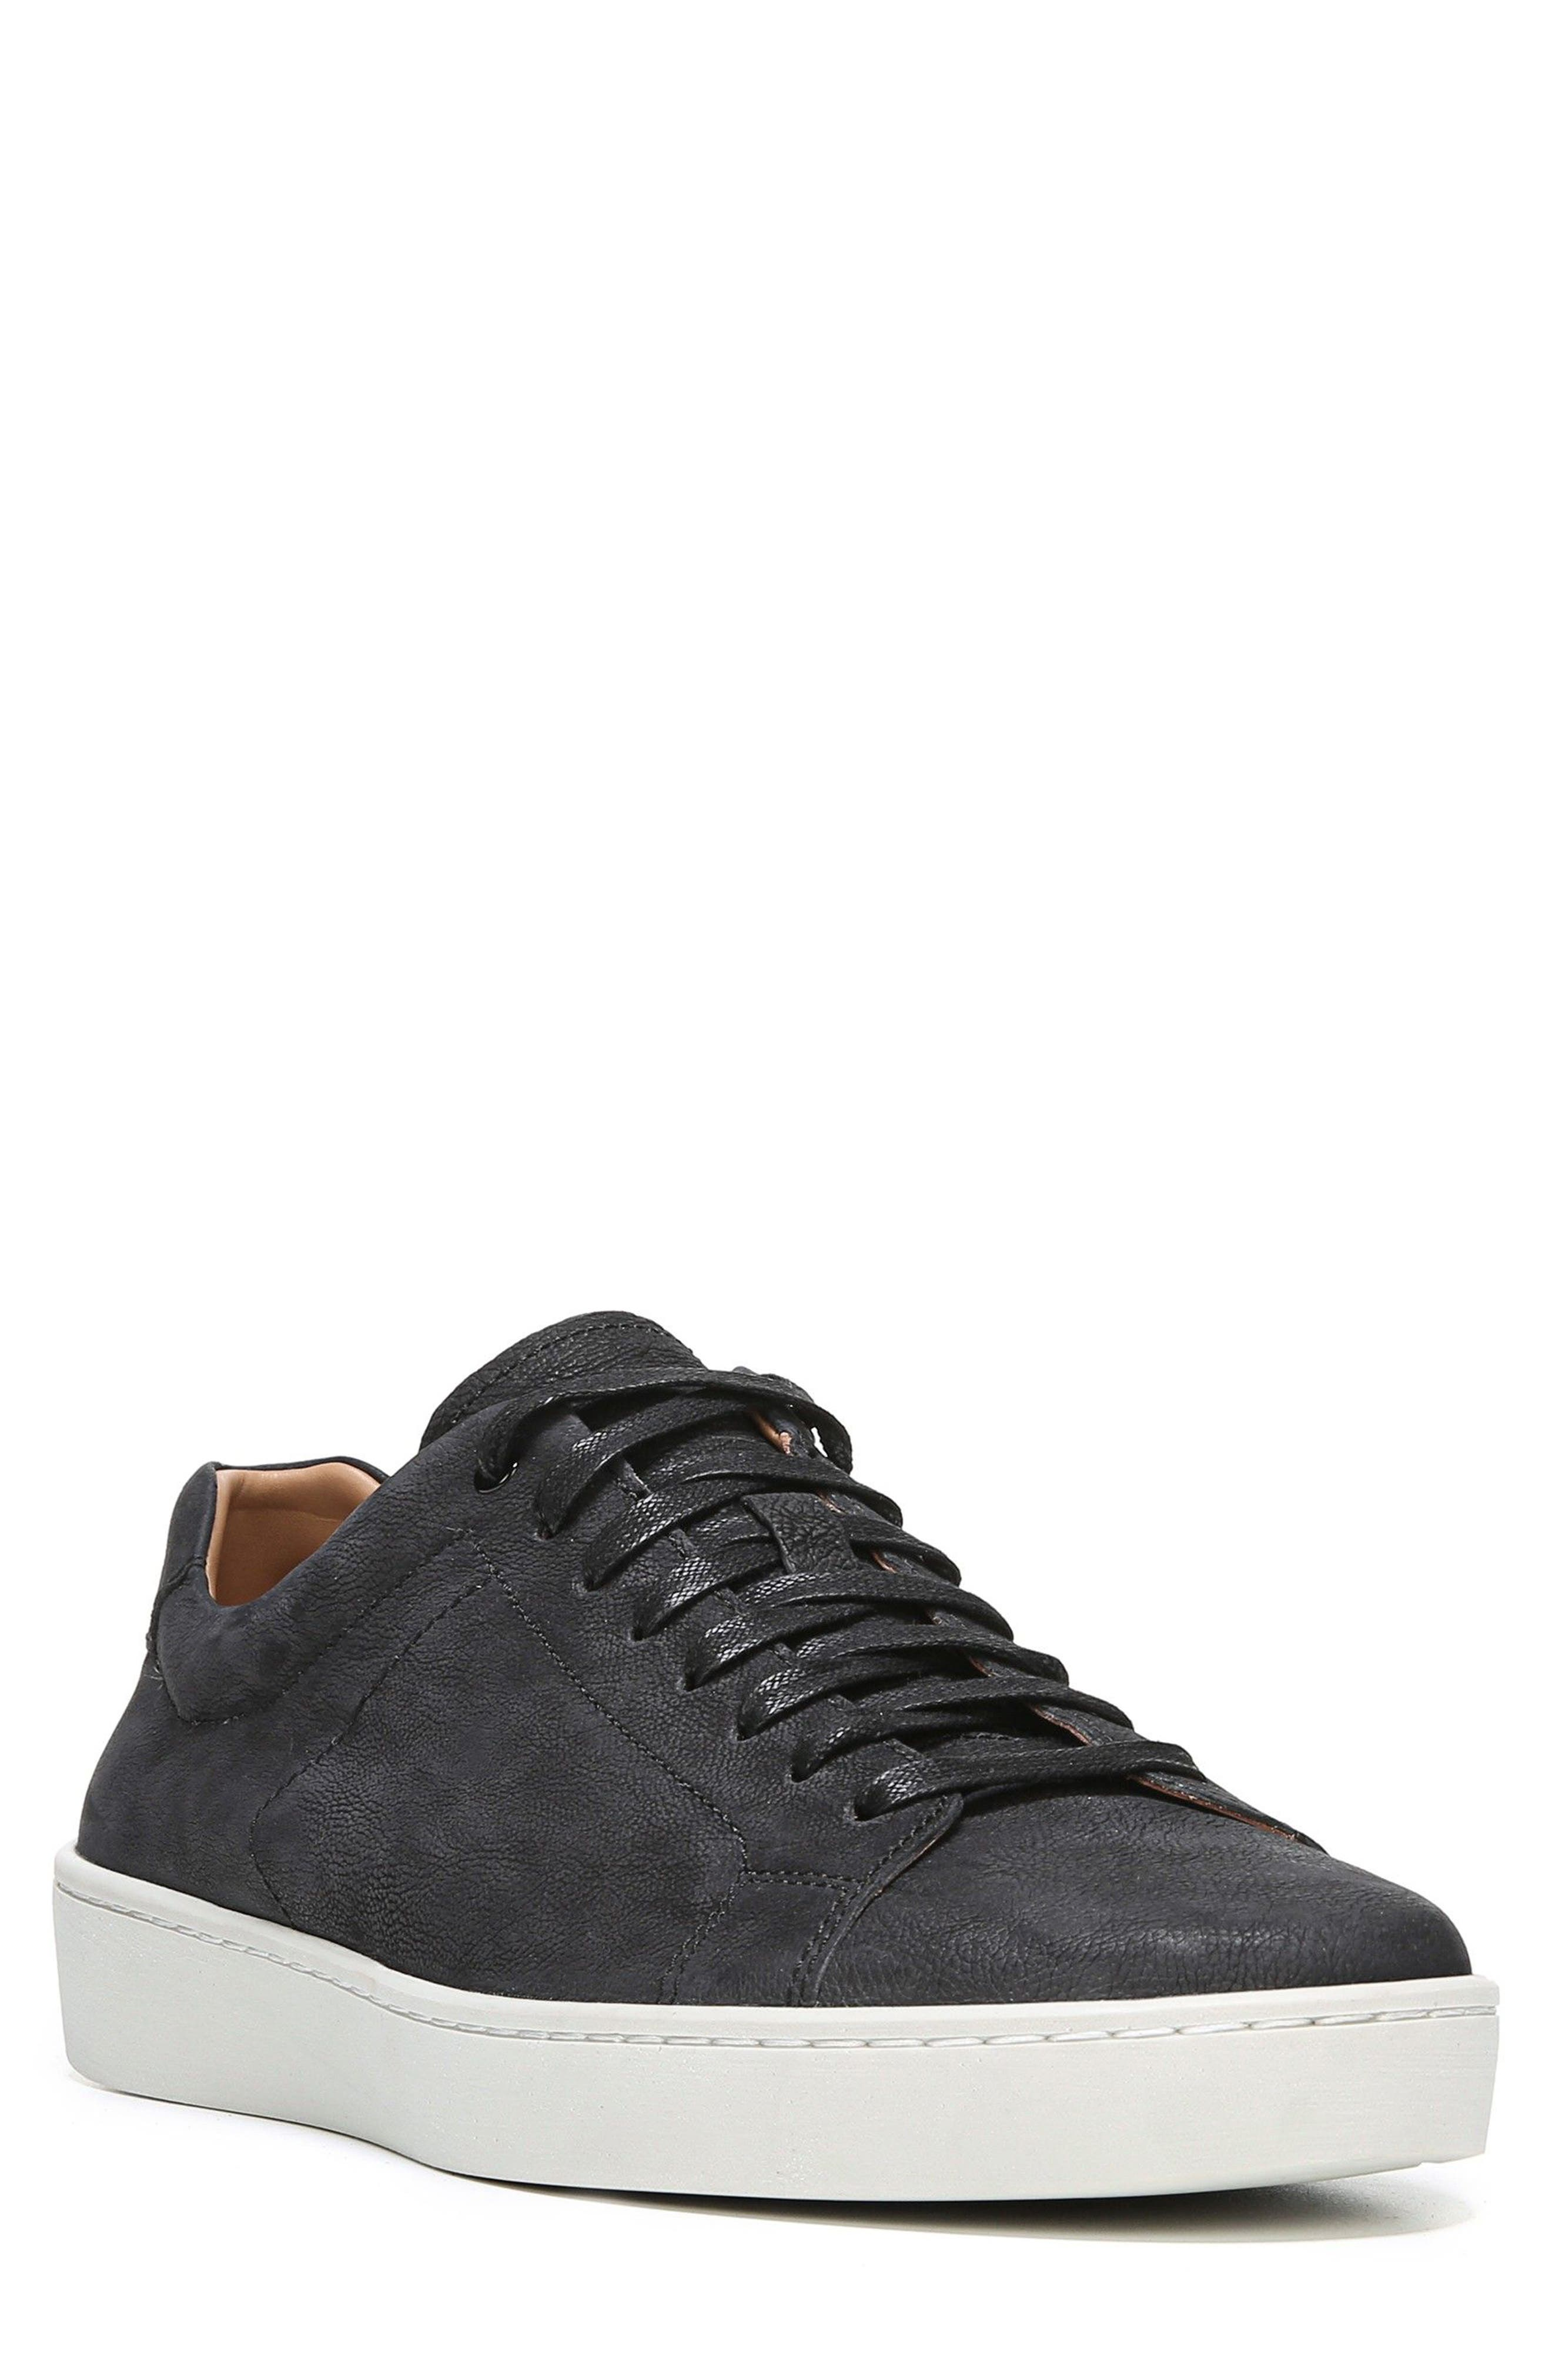 Slater Sneaker,                         Main,                         color, BLACK NUBUCK